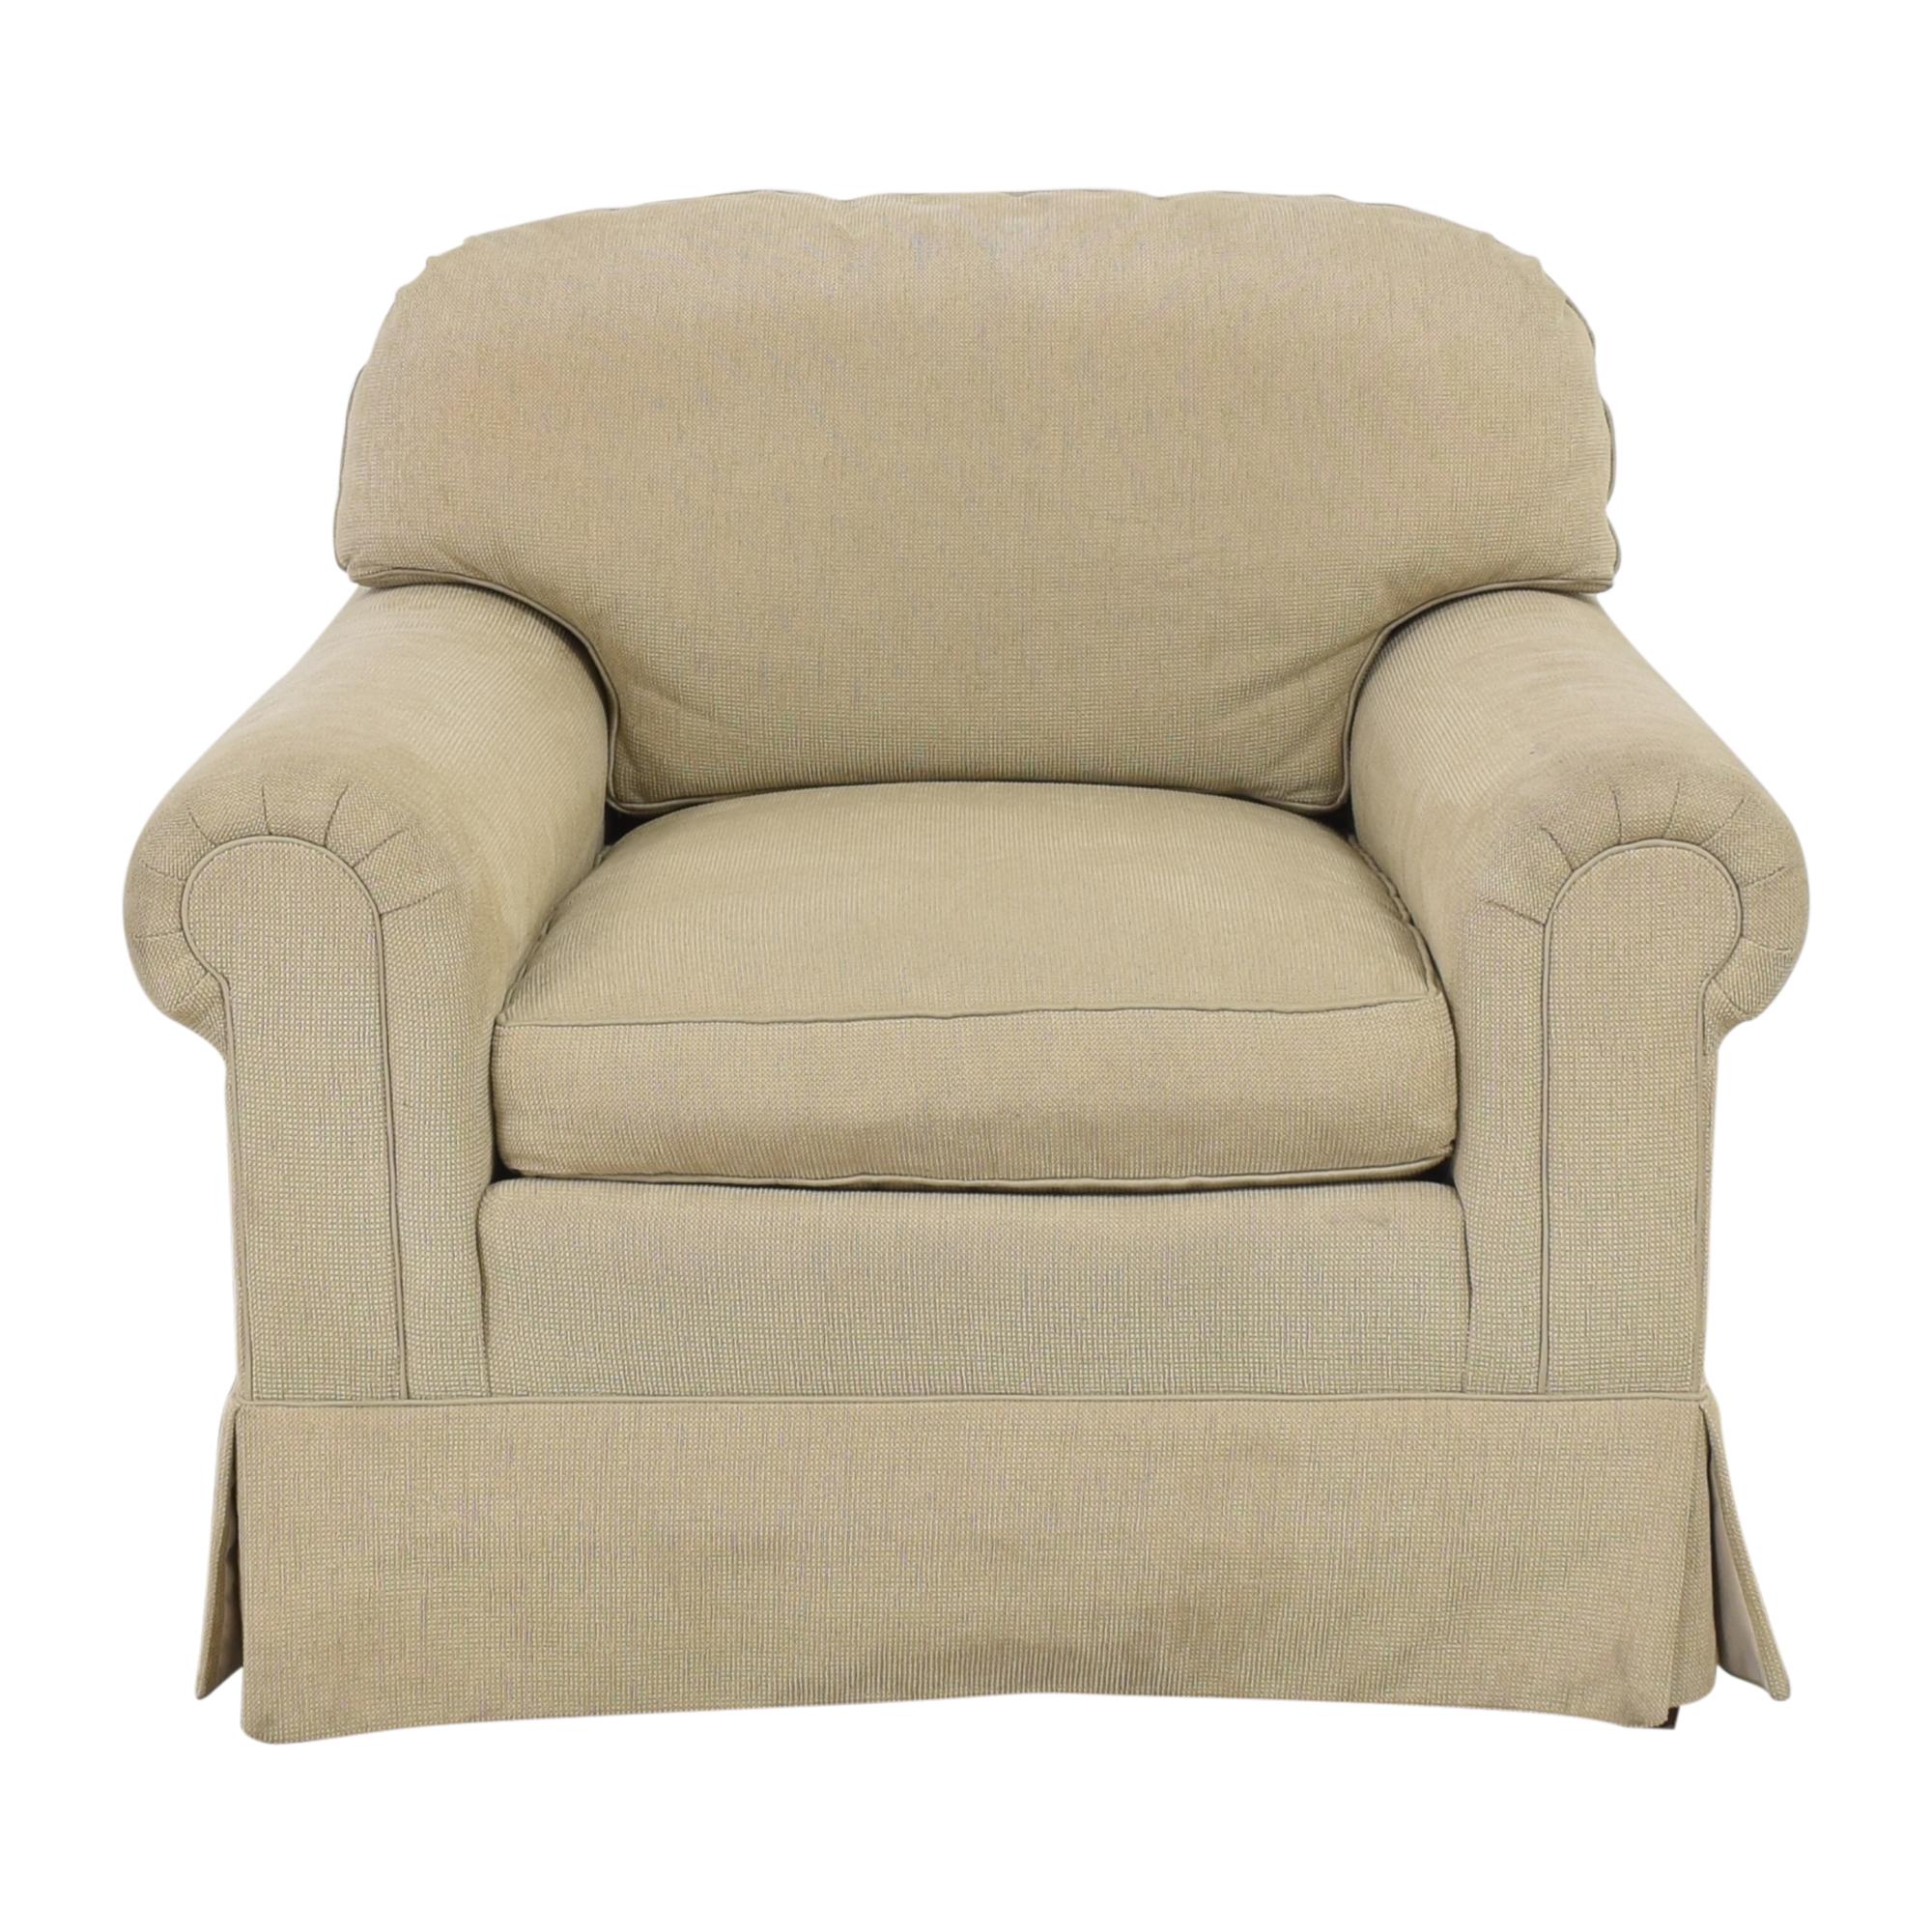 Bloomingdale's Bloomingdale's Alexandria Classic Club Chair for sale